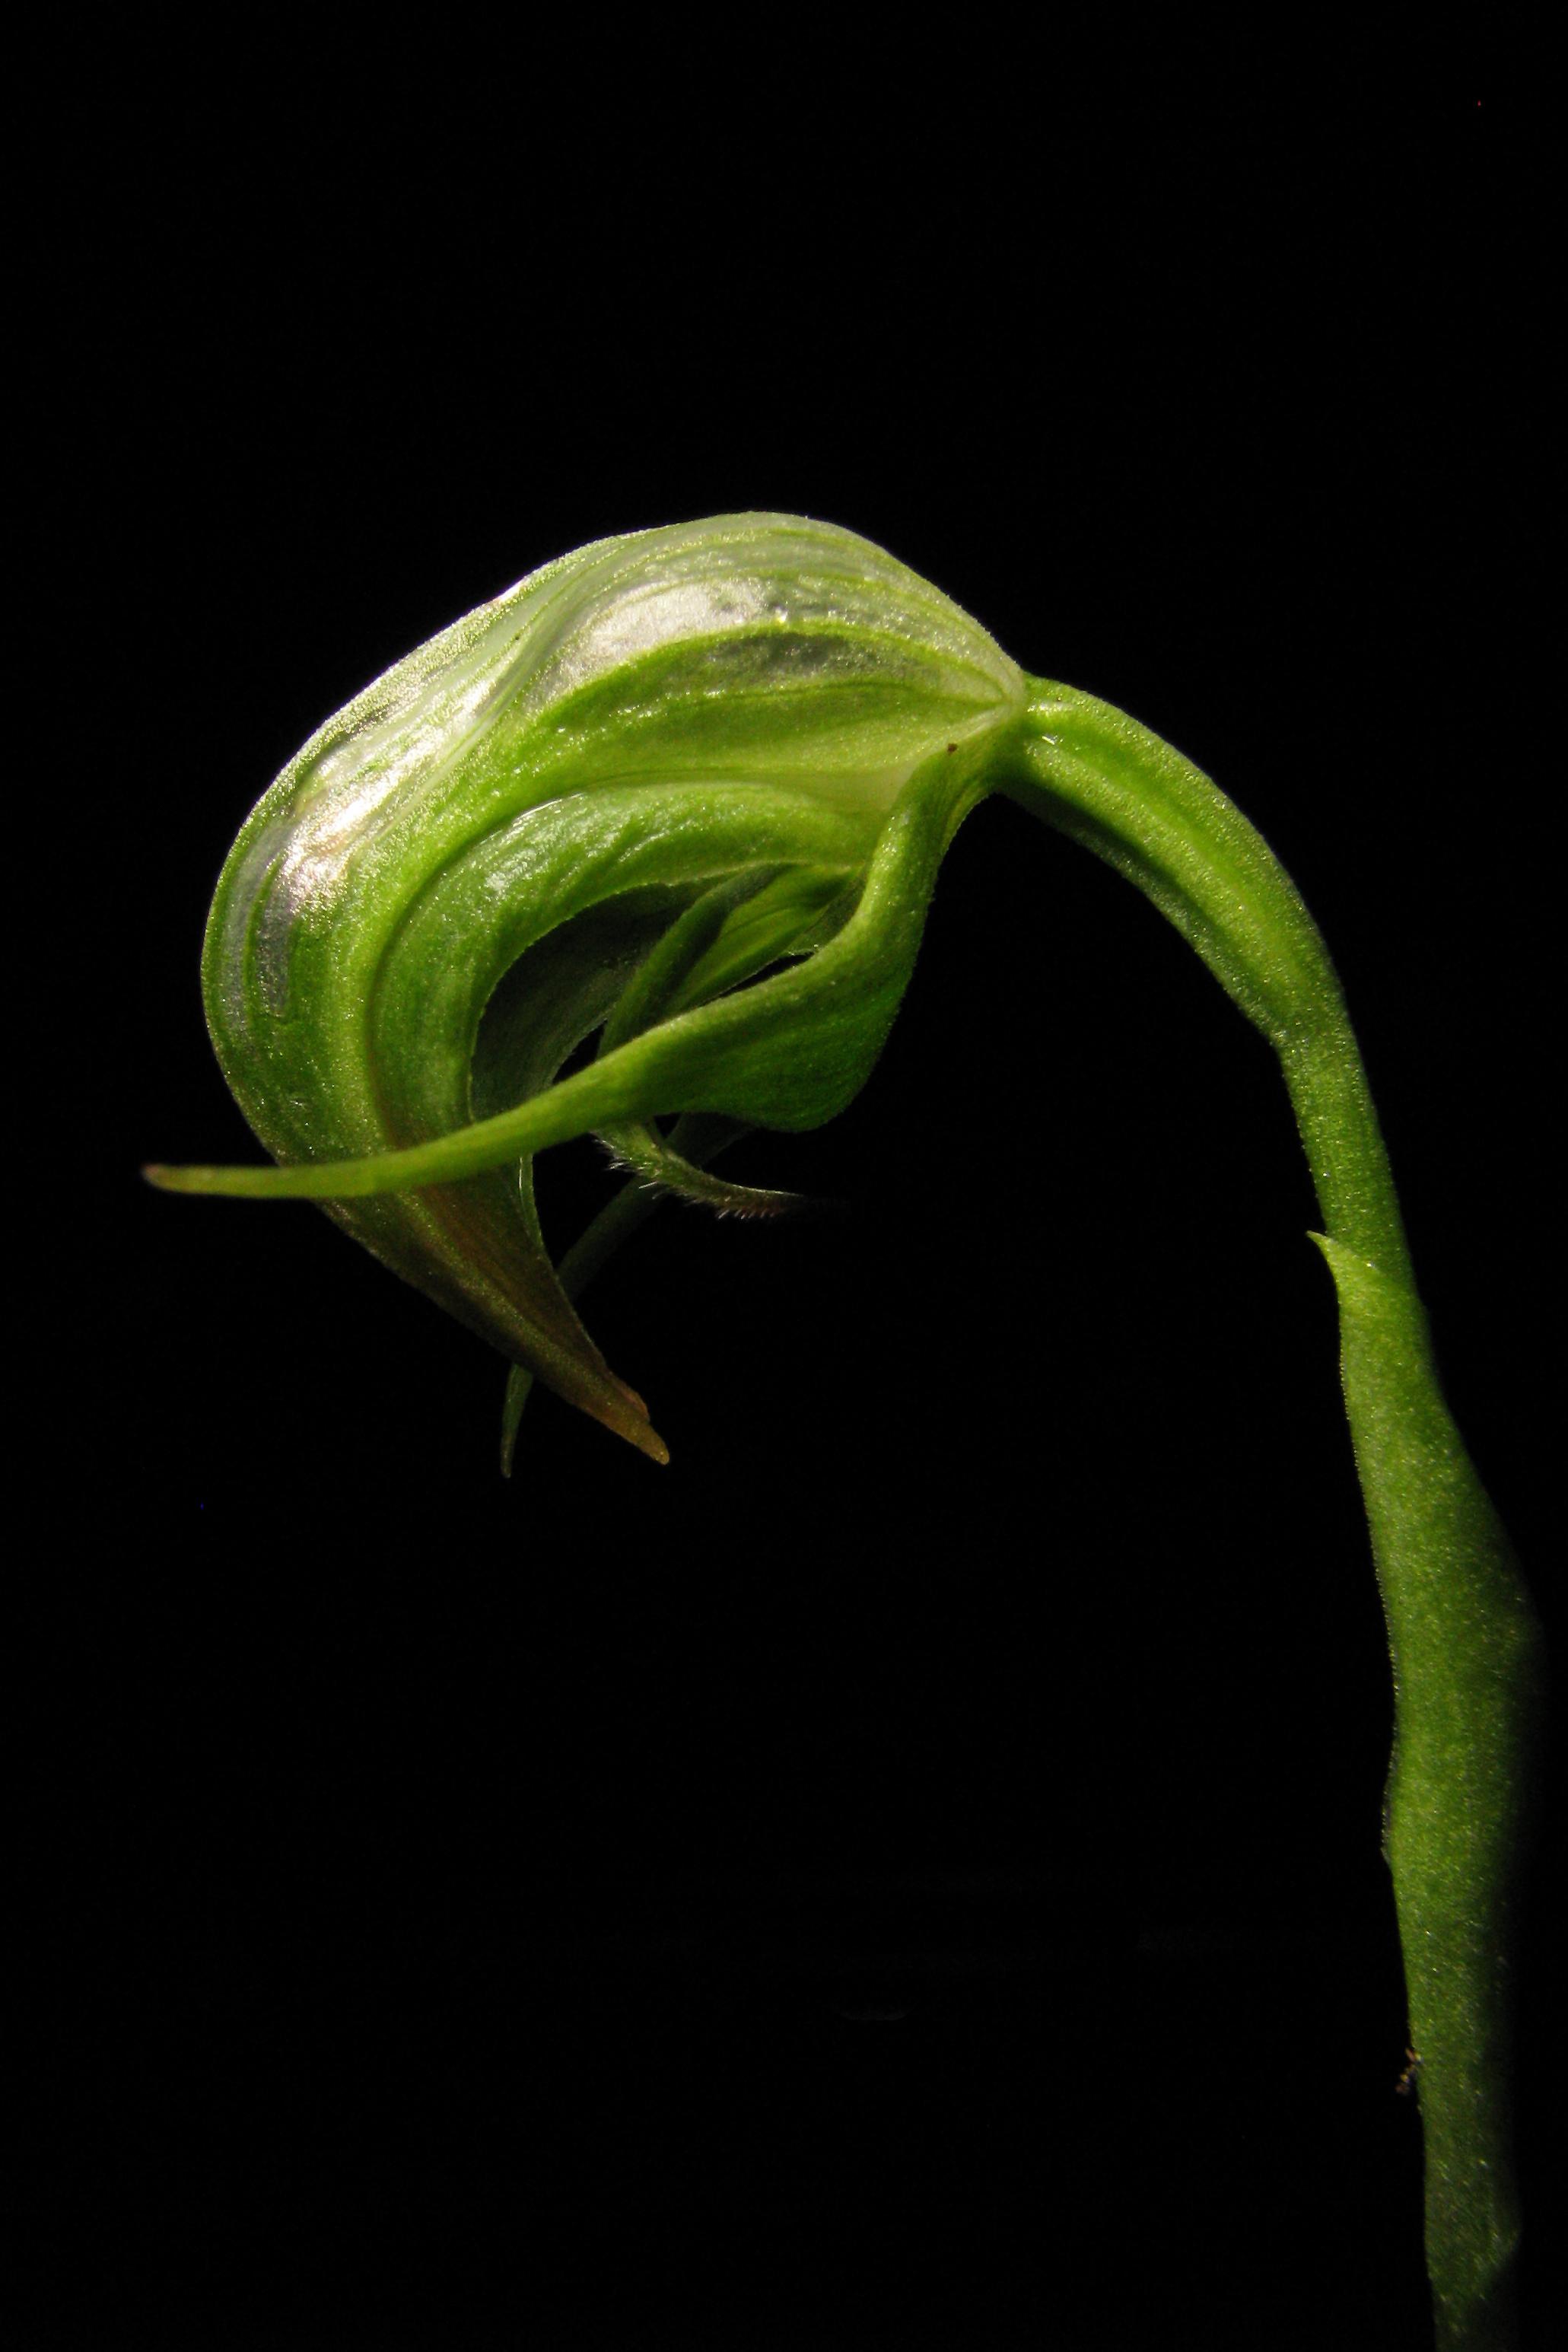 Image of Nodding greenhood